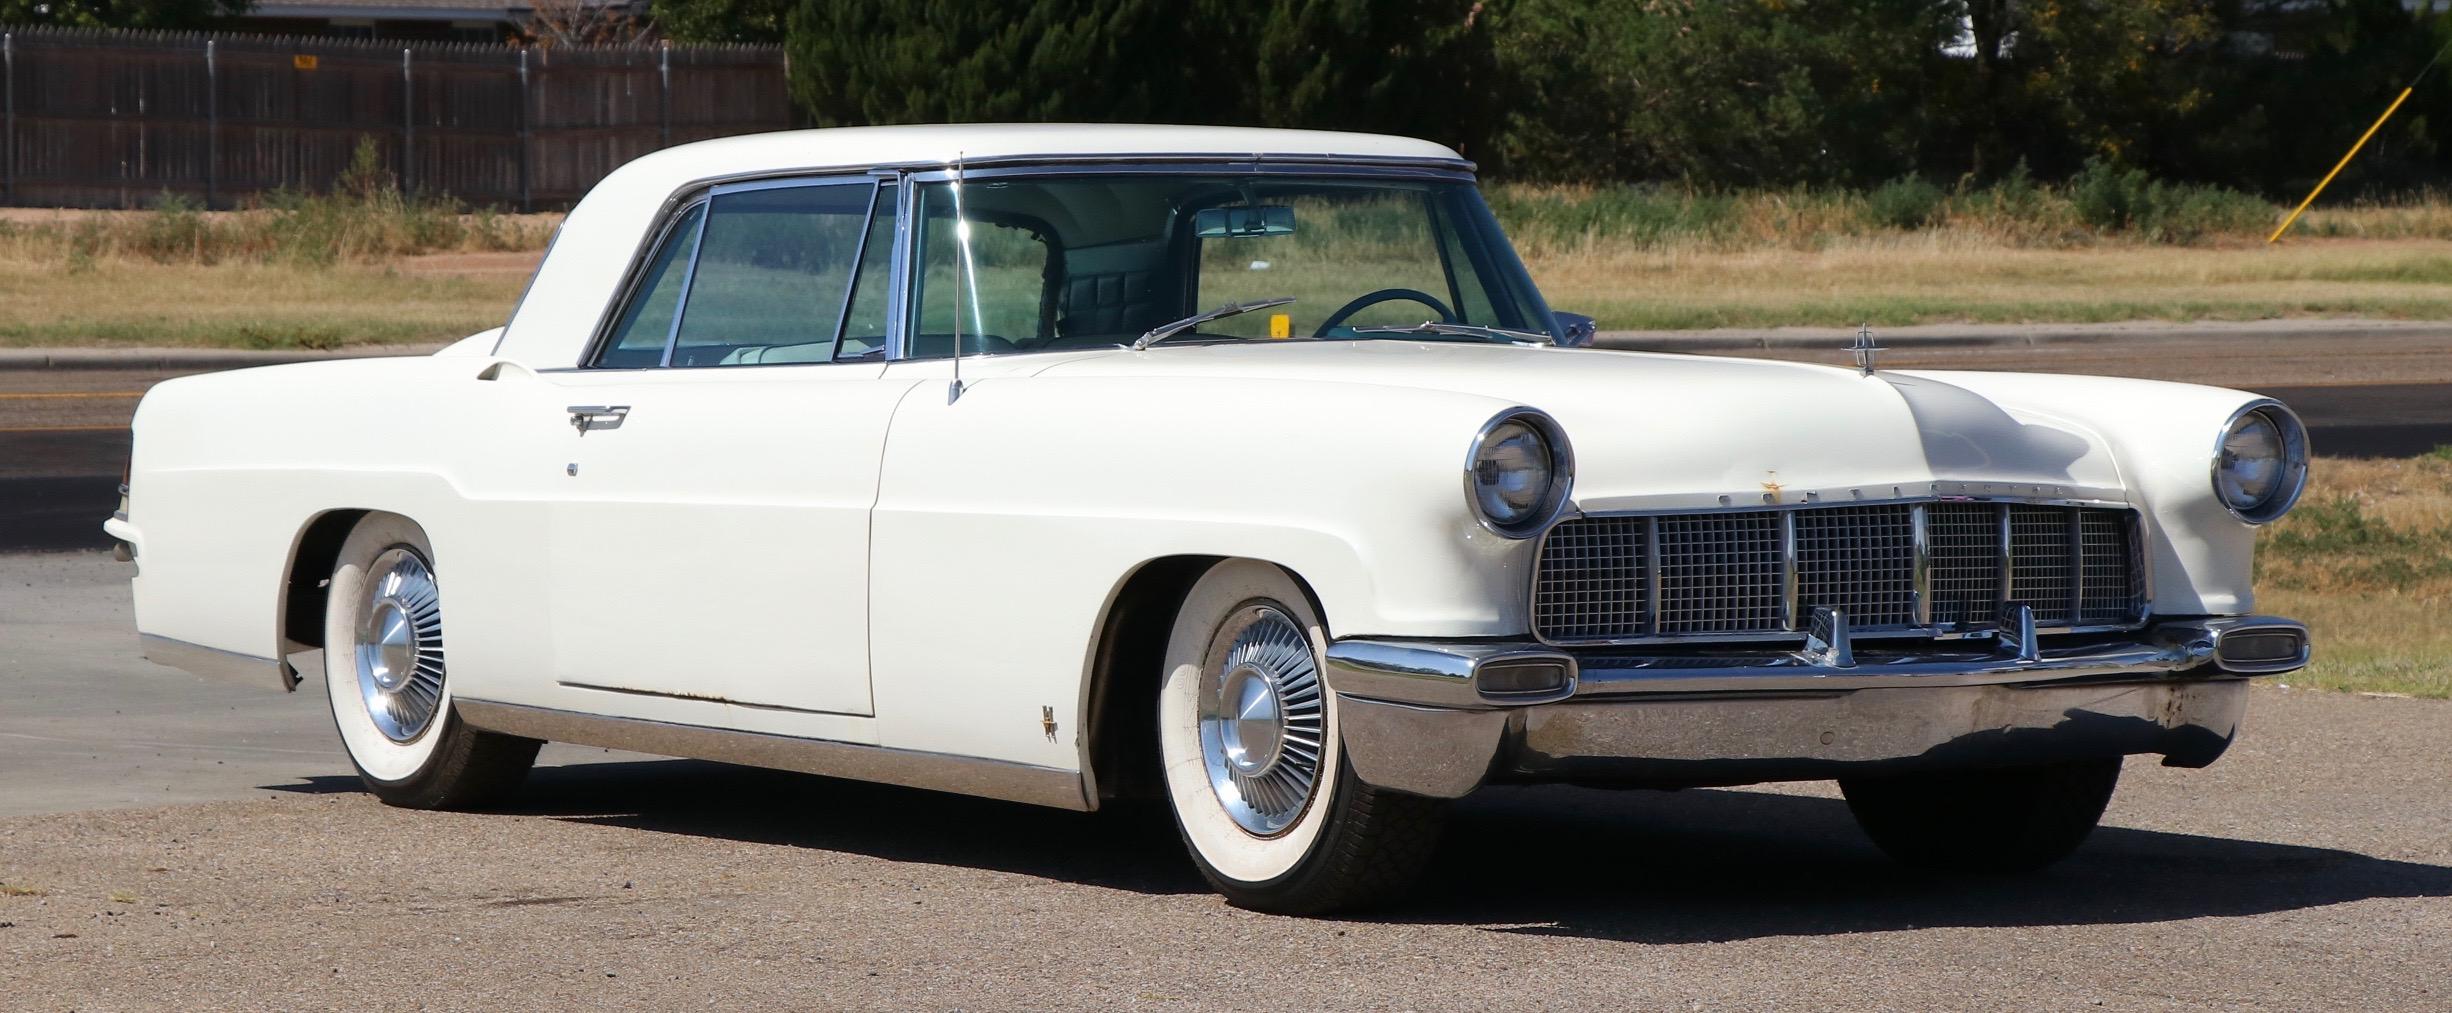 Mecum Auctions, 52 cars from Bill's Backyard Classics will cross the block in Dallas, ClassicCars.com Journal